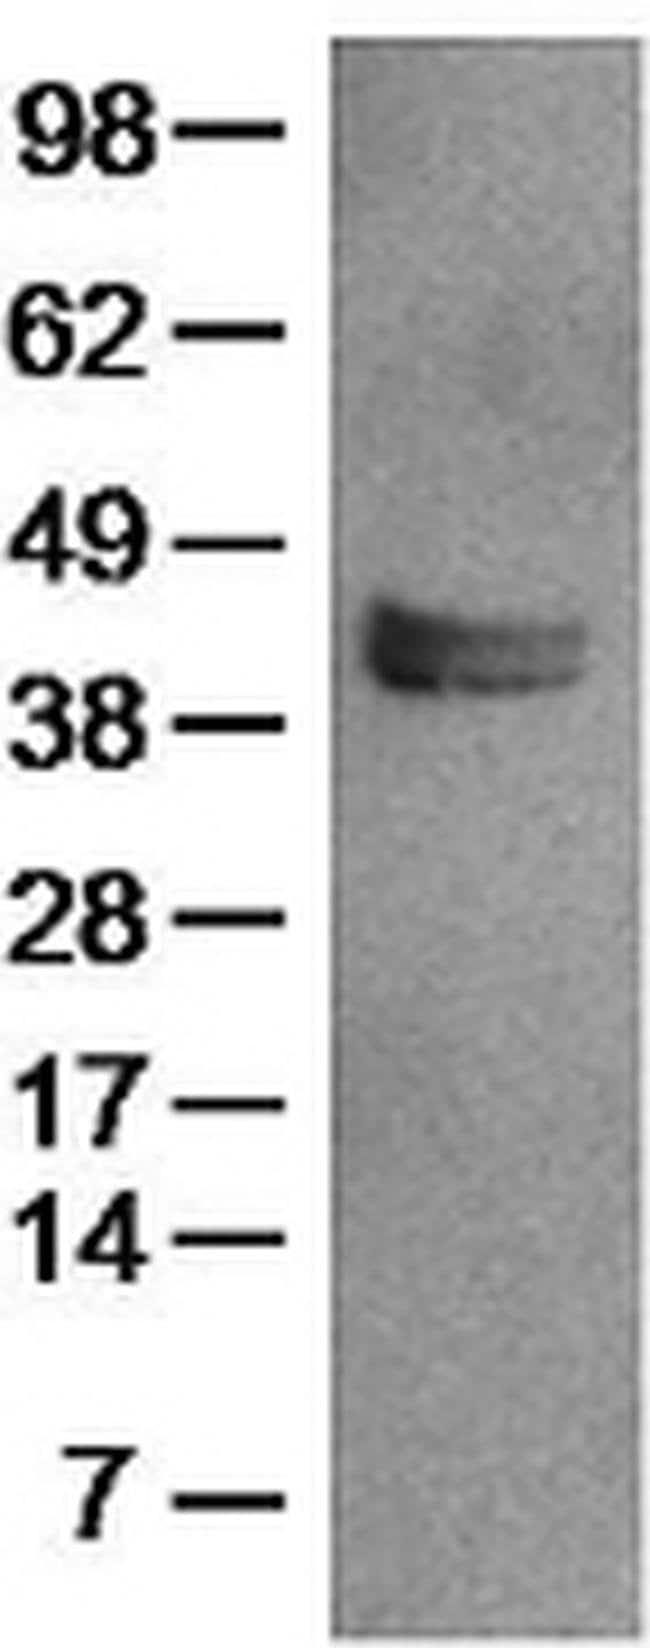 LAP (Latency Associated peptide) Mouse anti-Human, Functional Grade, Clone: VB3A9, eBioscience™ 100 μg; Functional Grade LAP (Latency Associated peptide) Mouse anti-Human, Functional Grade, Clone: VB3A9, eBioscience™